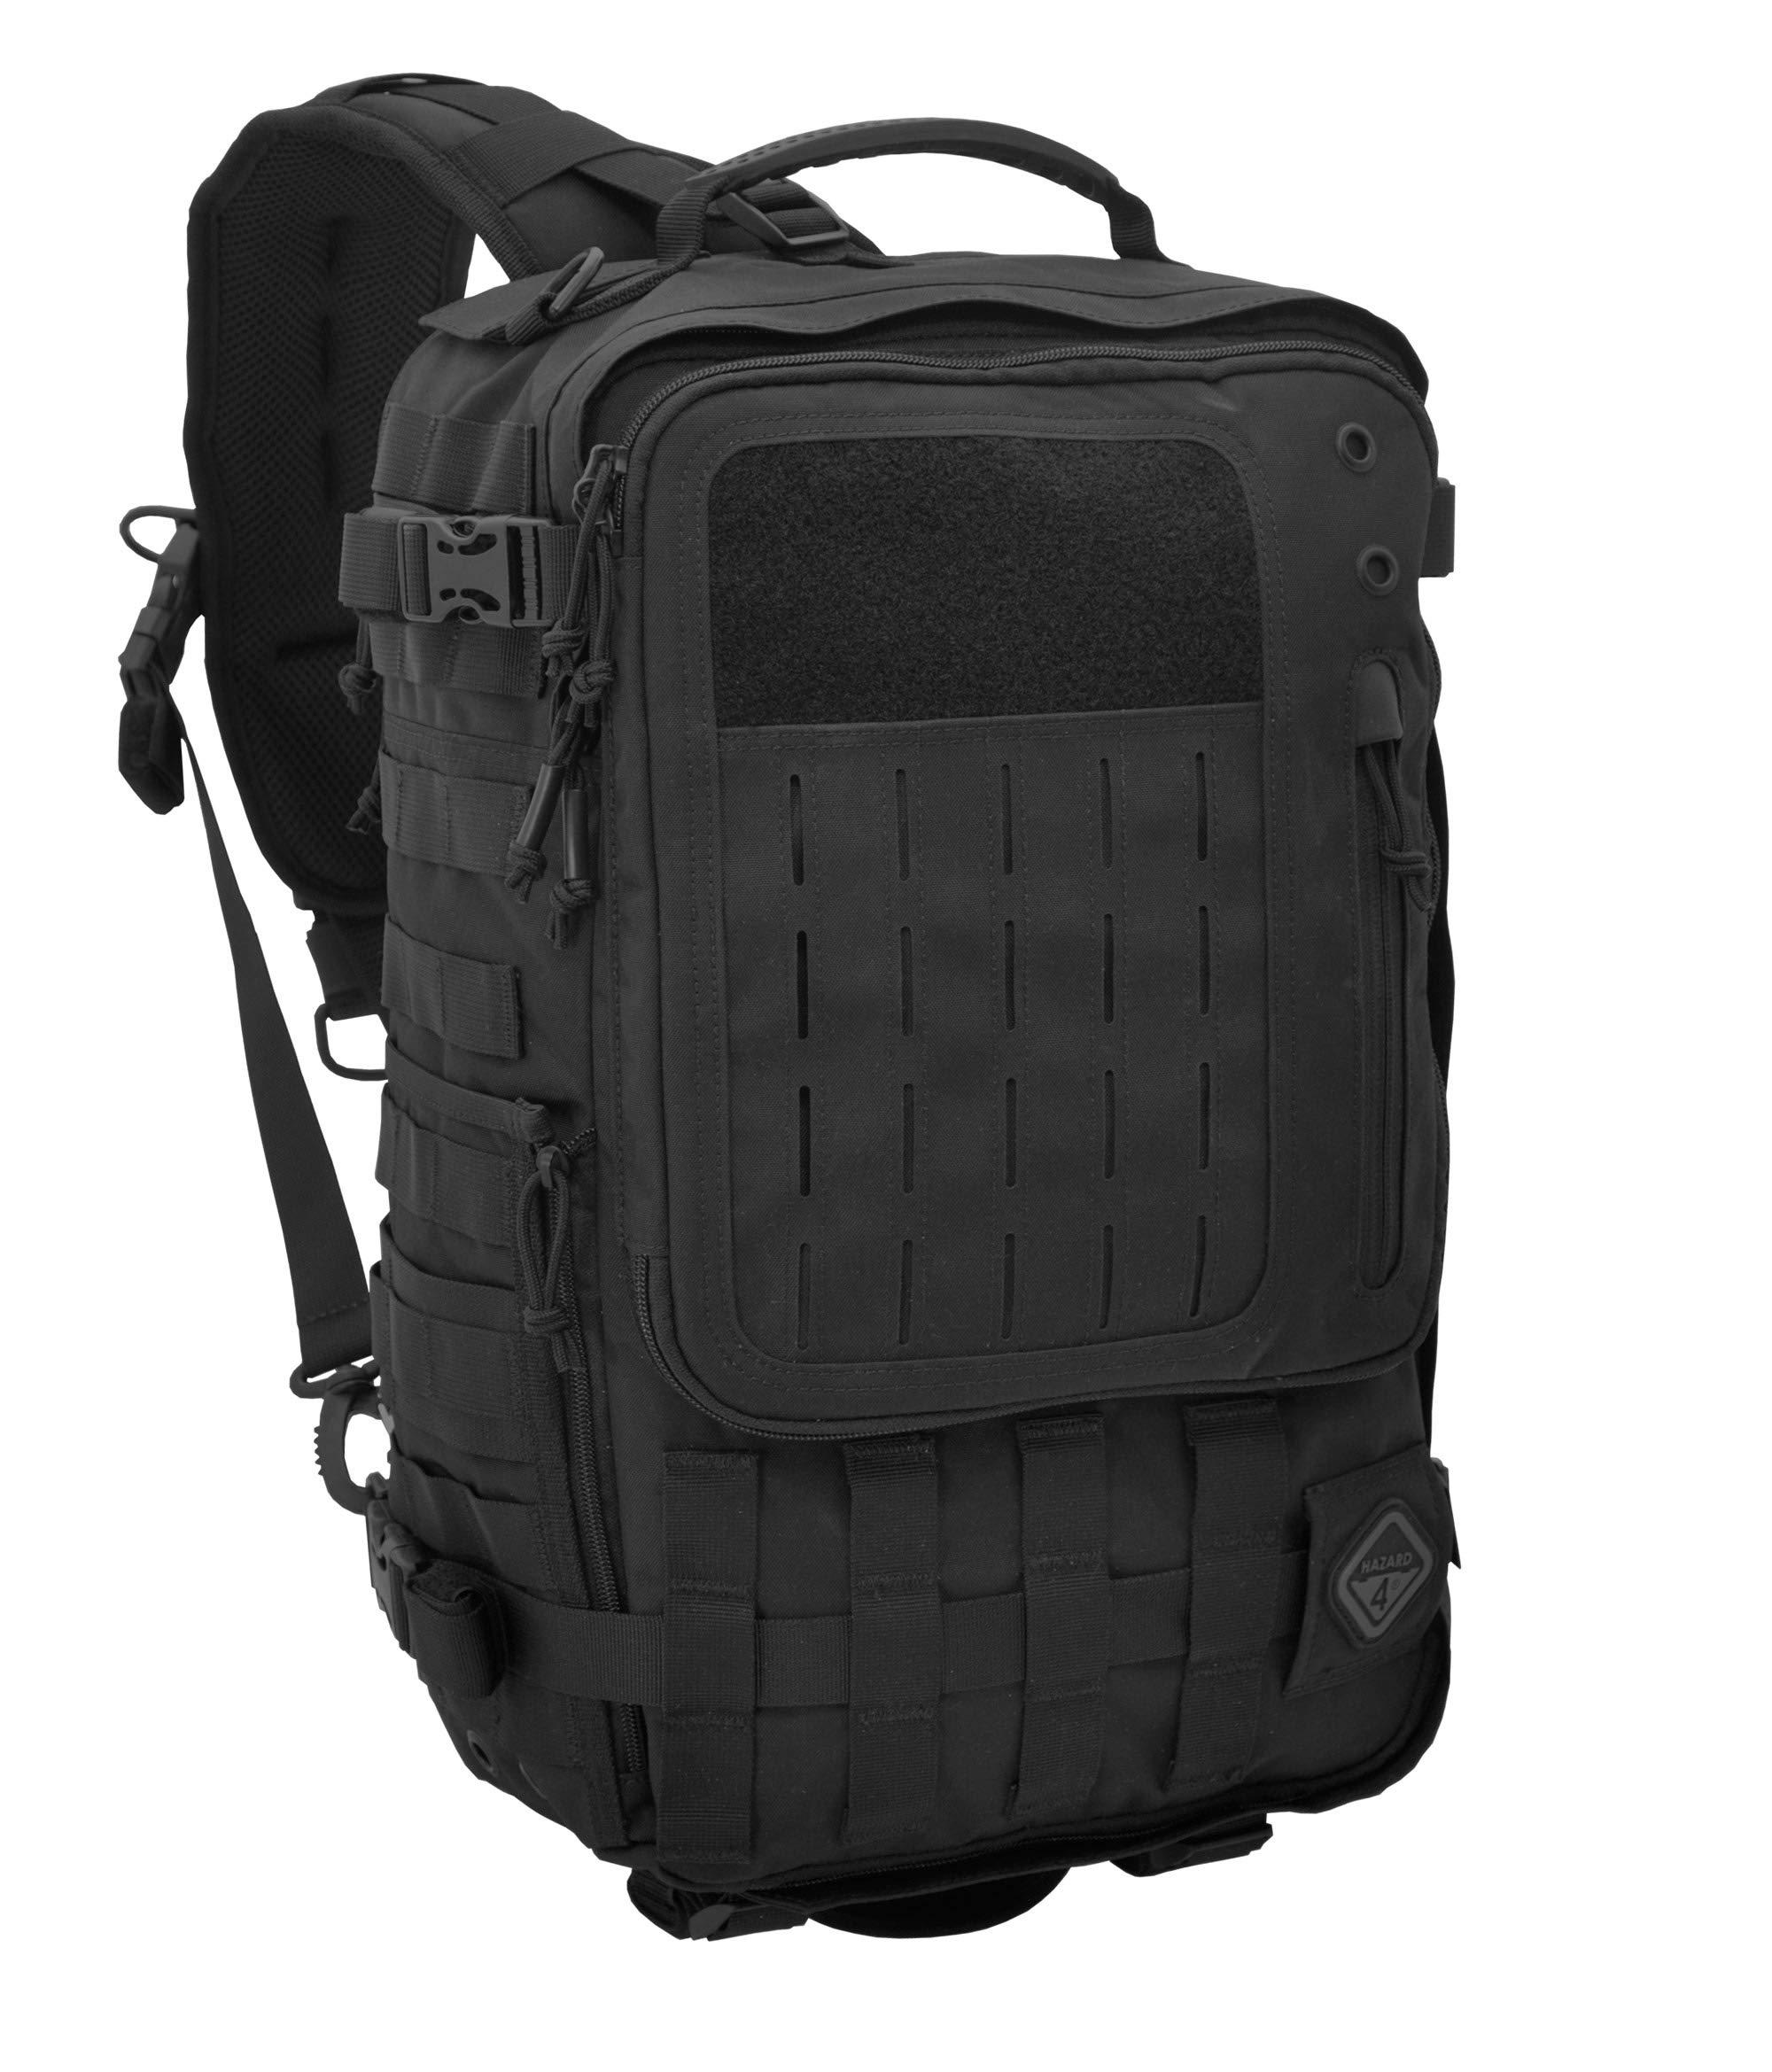 Sidewinder(TM) Full-Sized Laptop Sling Pack by Hazard 4(R) - Black